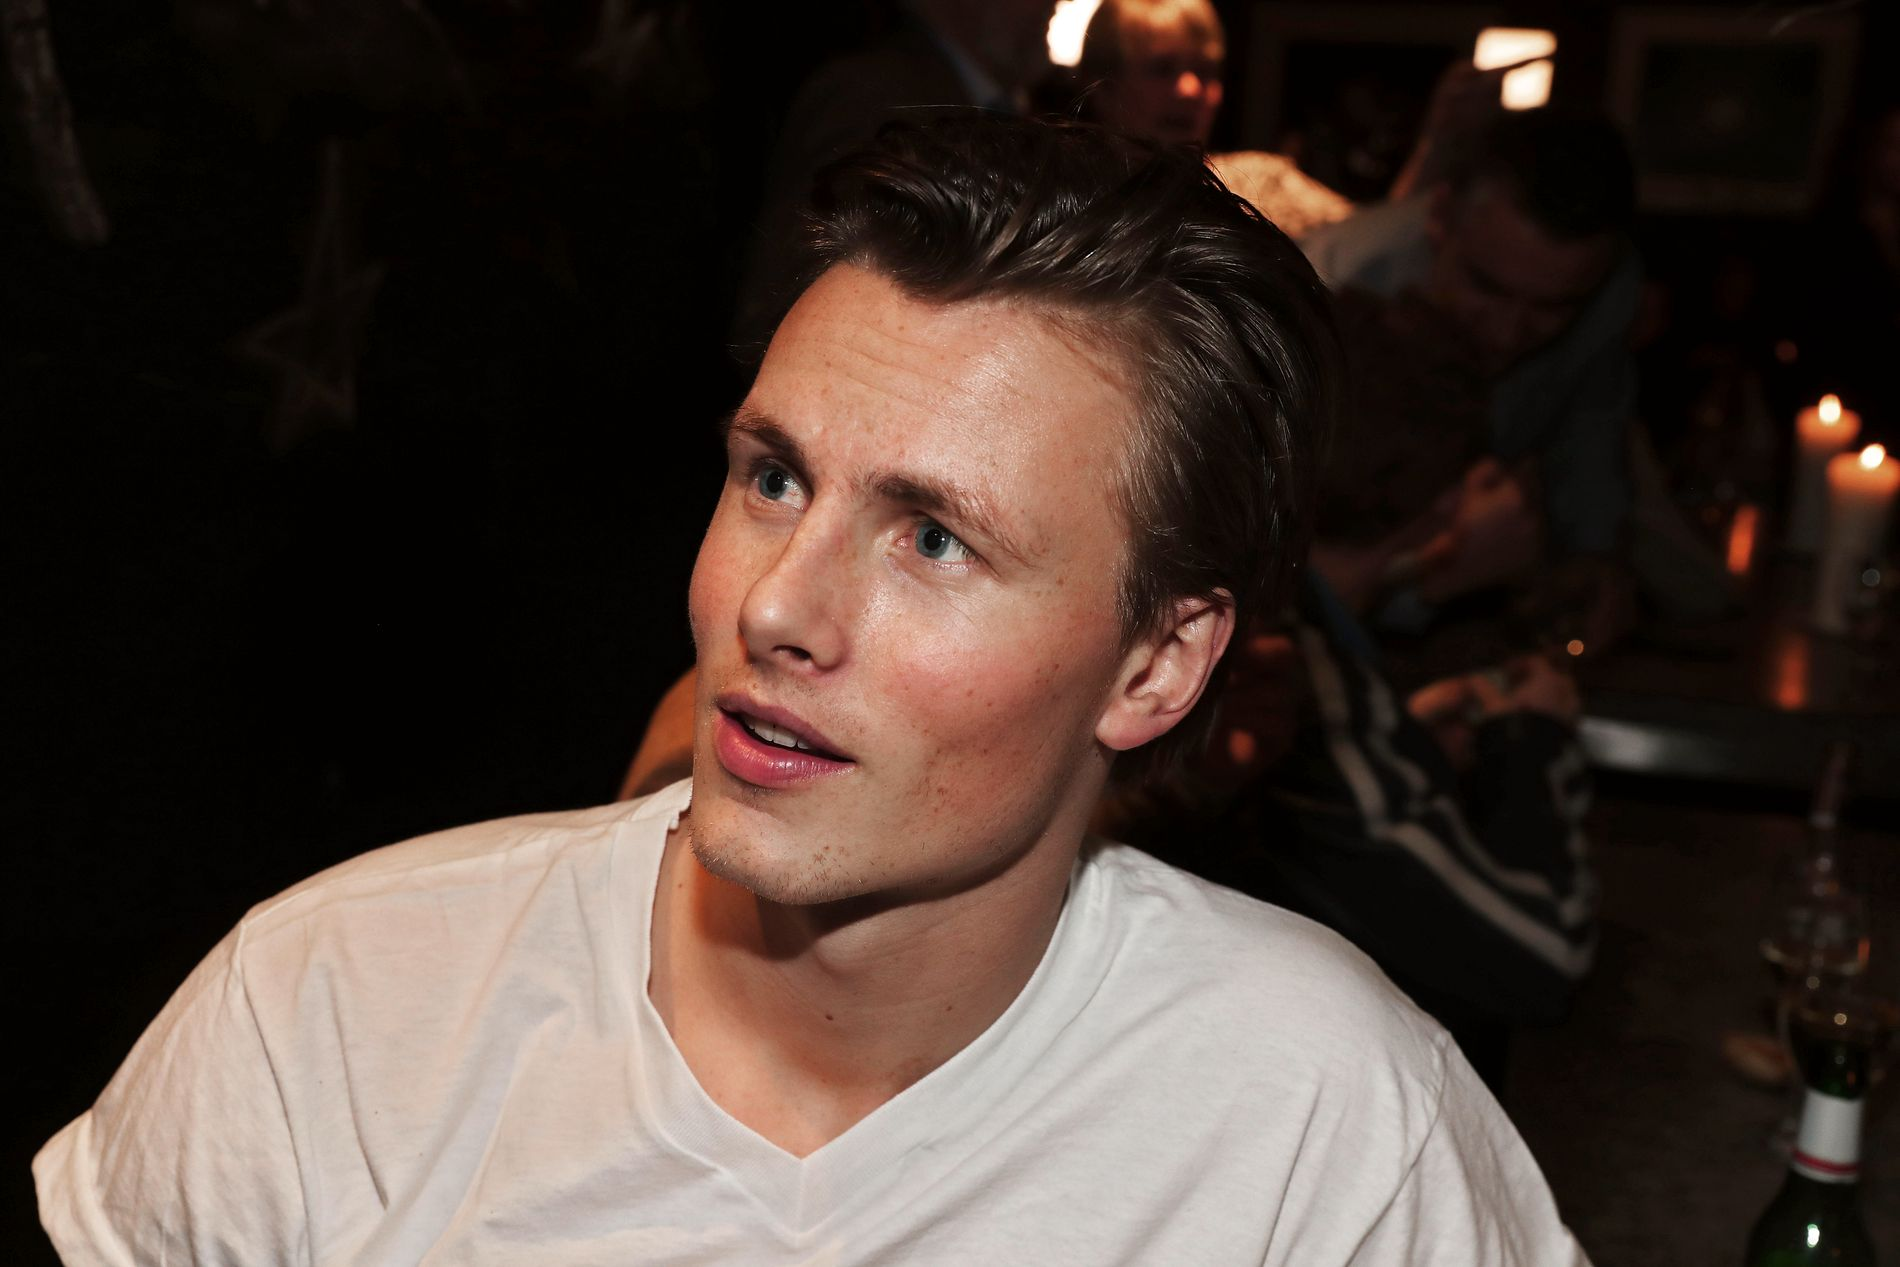 MED KOMPISER: Lavrans Solli kom uten forloveden Anja Johansen. Han hadde med seg en gjeng kompiser på finalefesten.